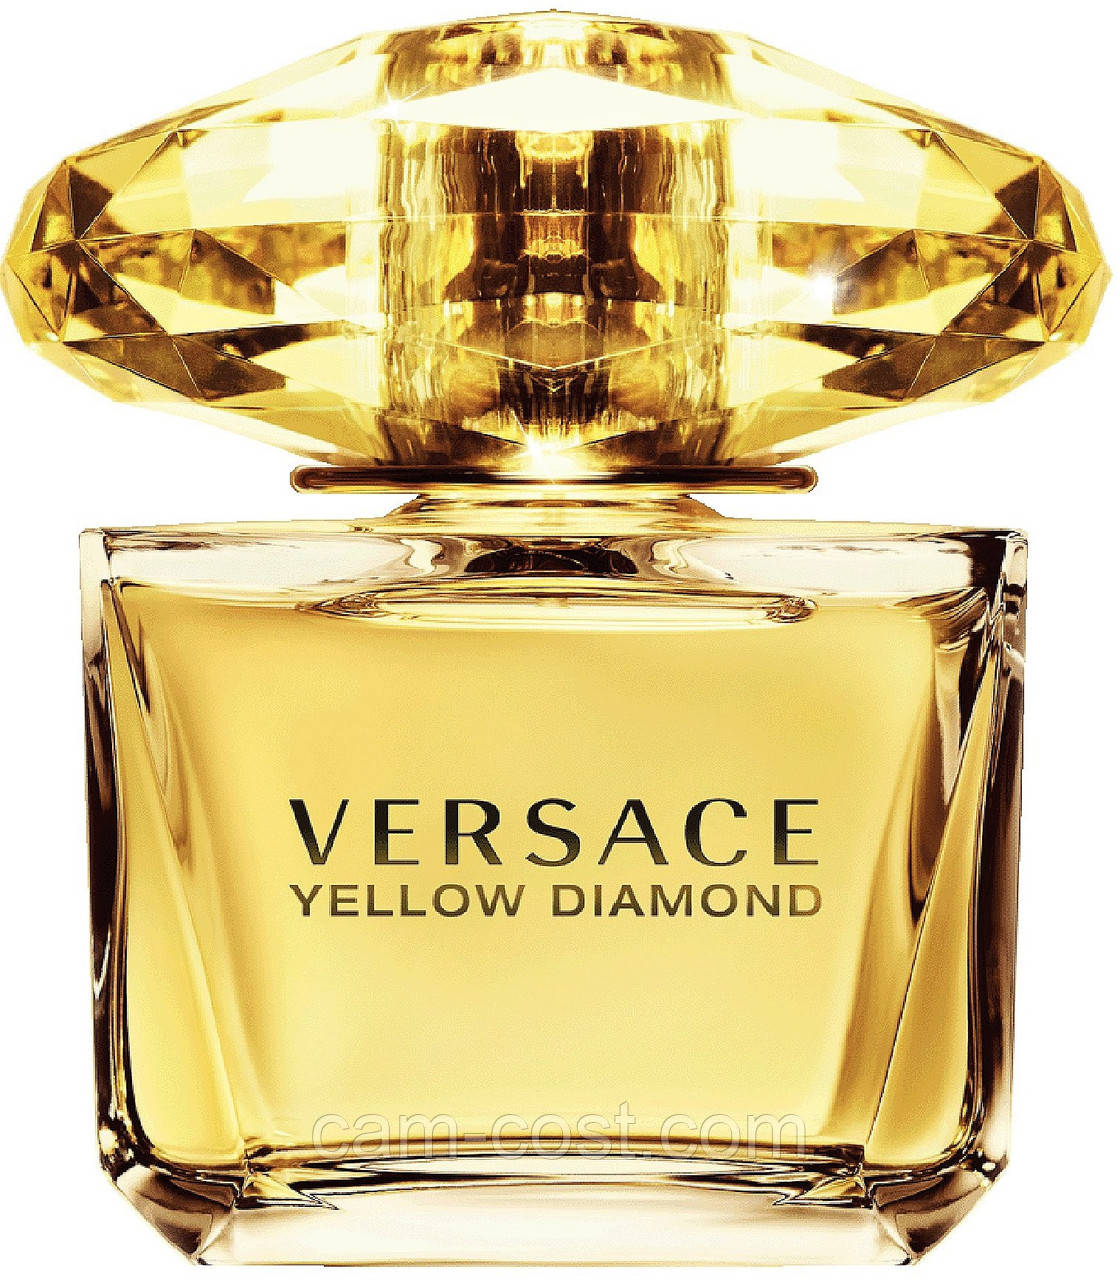 Versace Yellow Diamond (Версаче Йеллоу Даймонд) edt 30 ml (ORIGINAL)